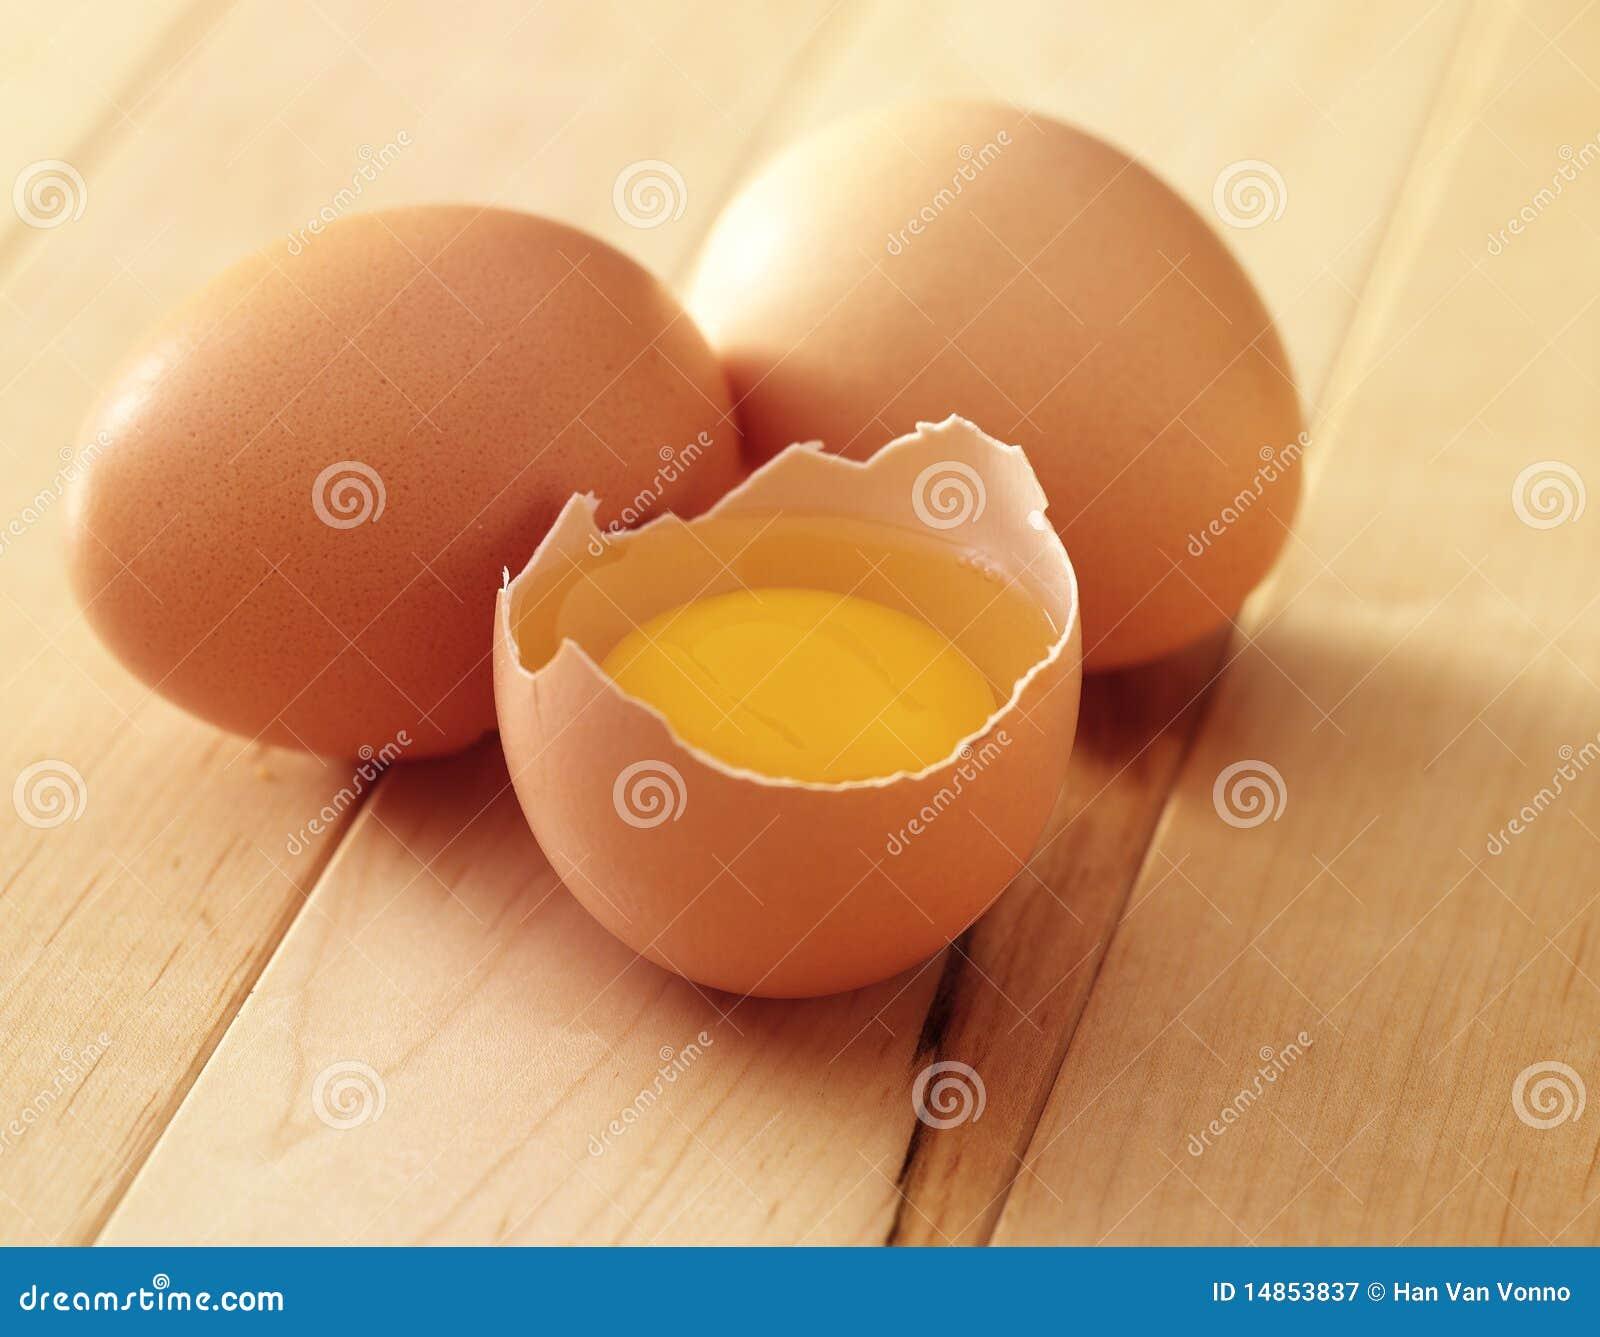 Three eggs one broken